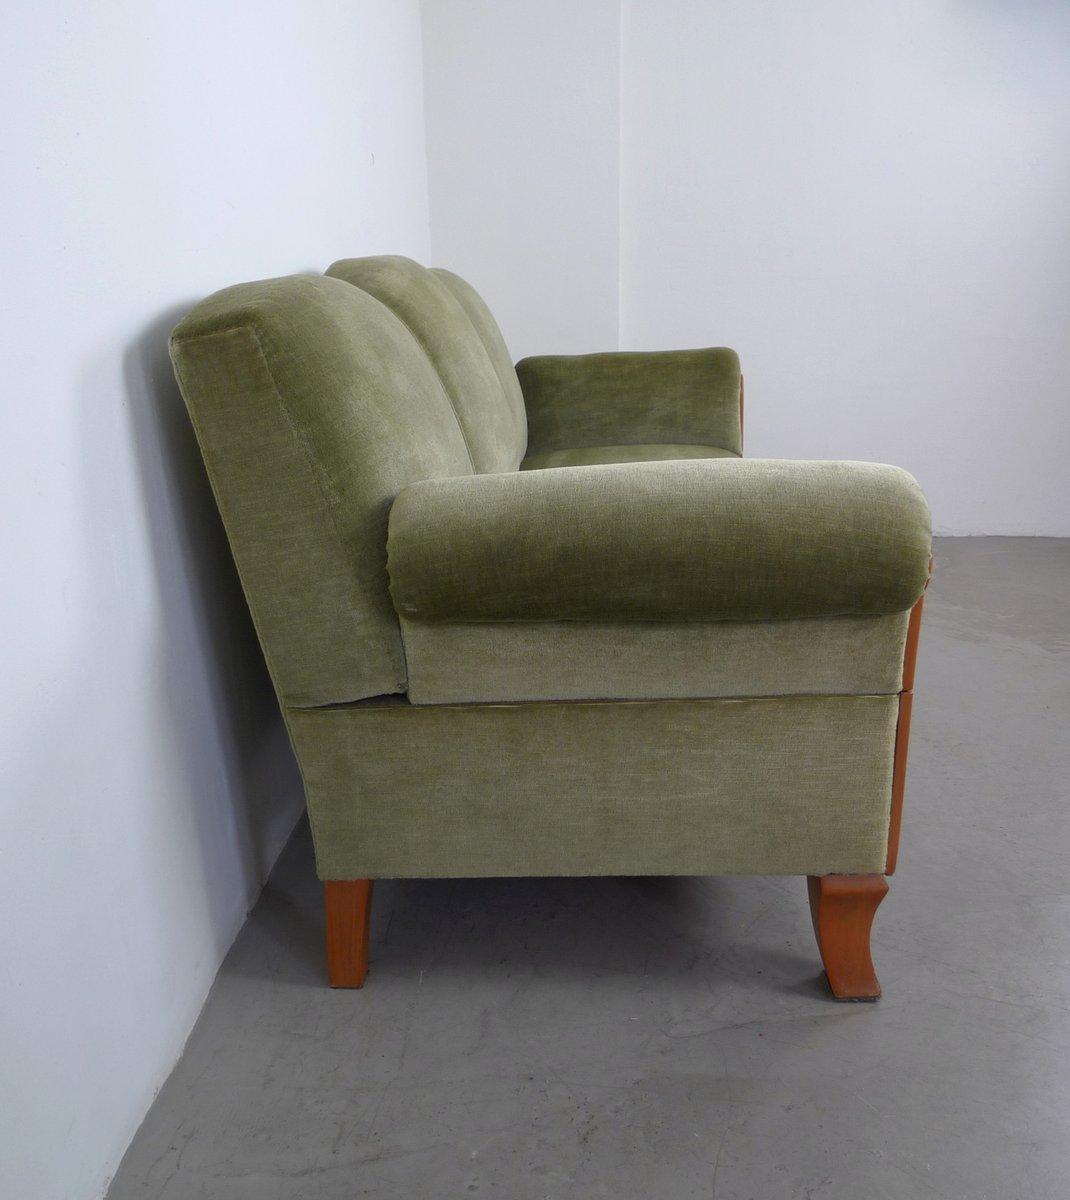 3 seater cherry framed sofa from joseph kreuzburg 1930s for sale at pamono. Black Bedroom Furniture Sets. Home Design Ideas